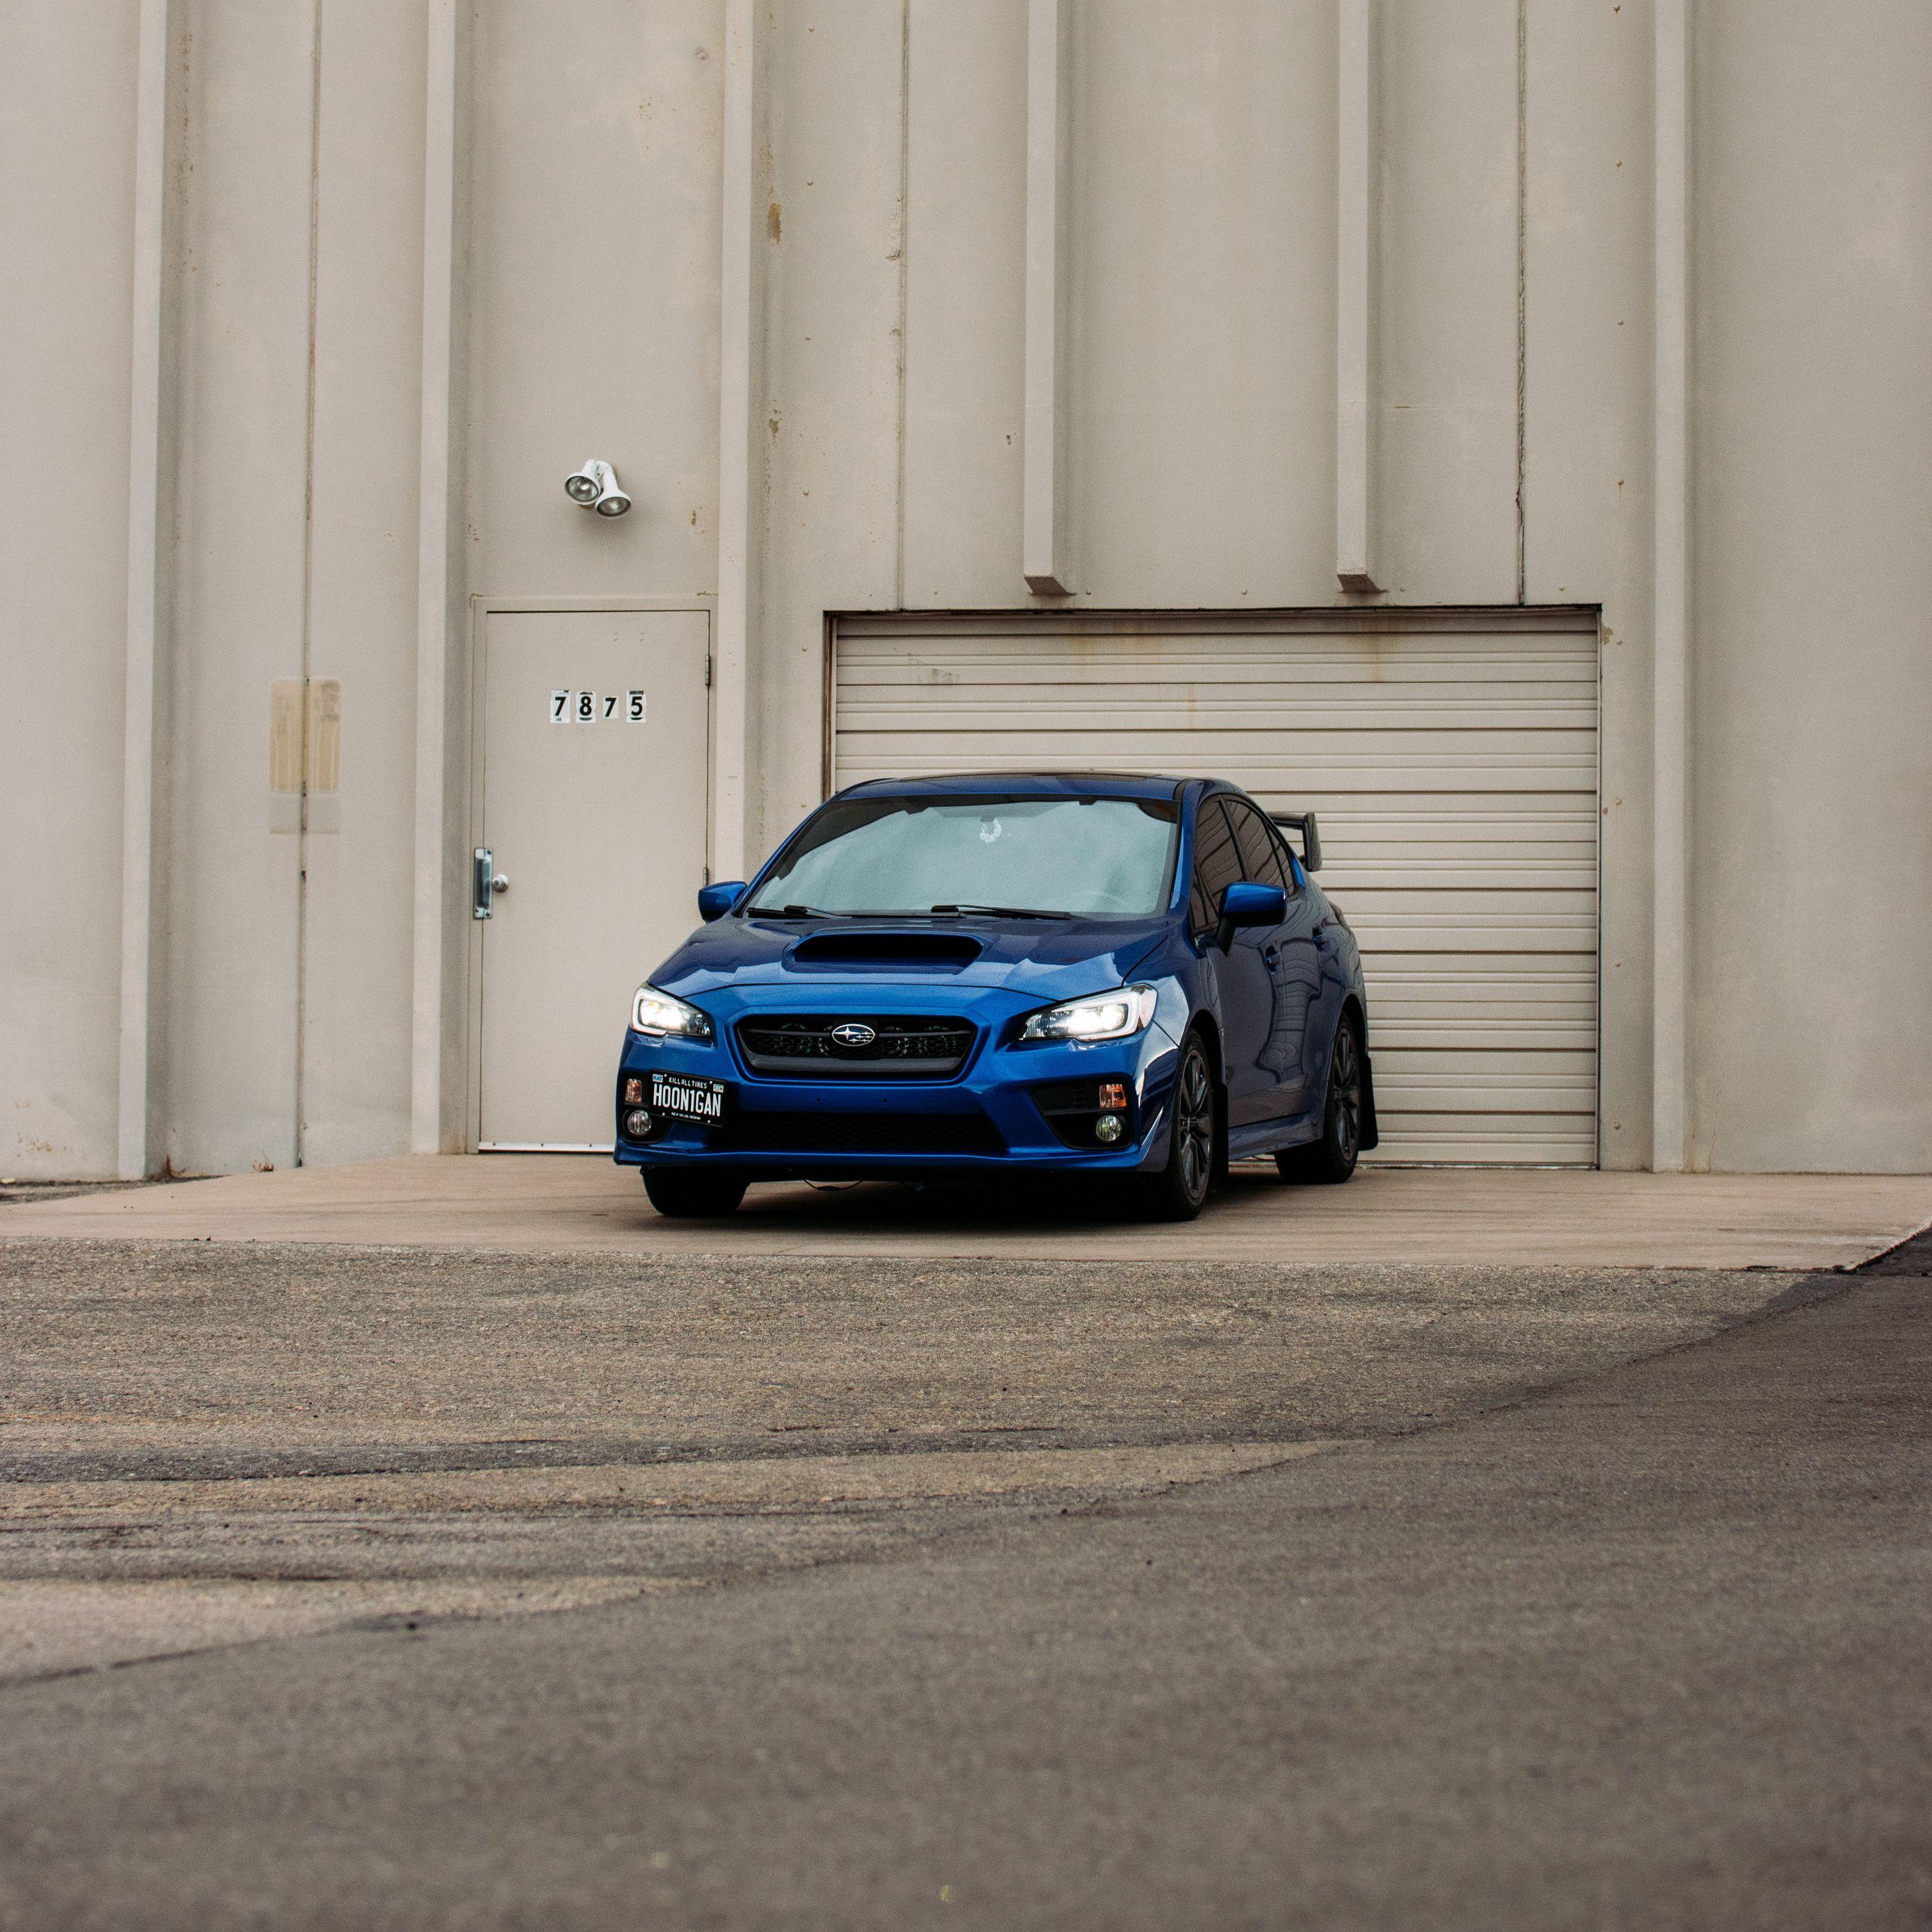 2780x2780 Wallpaper subaru, car, blue, parking, front view